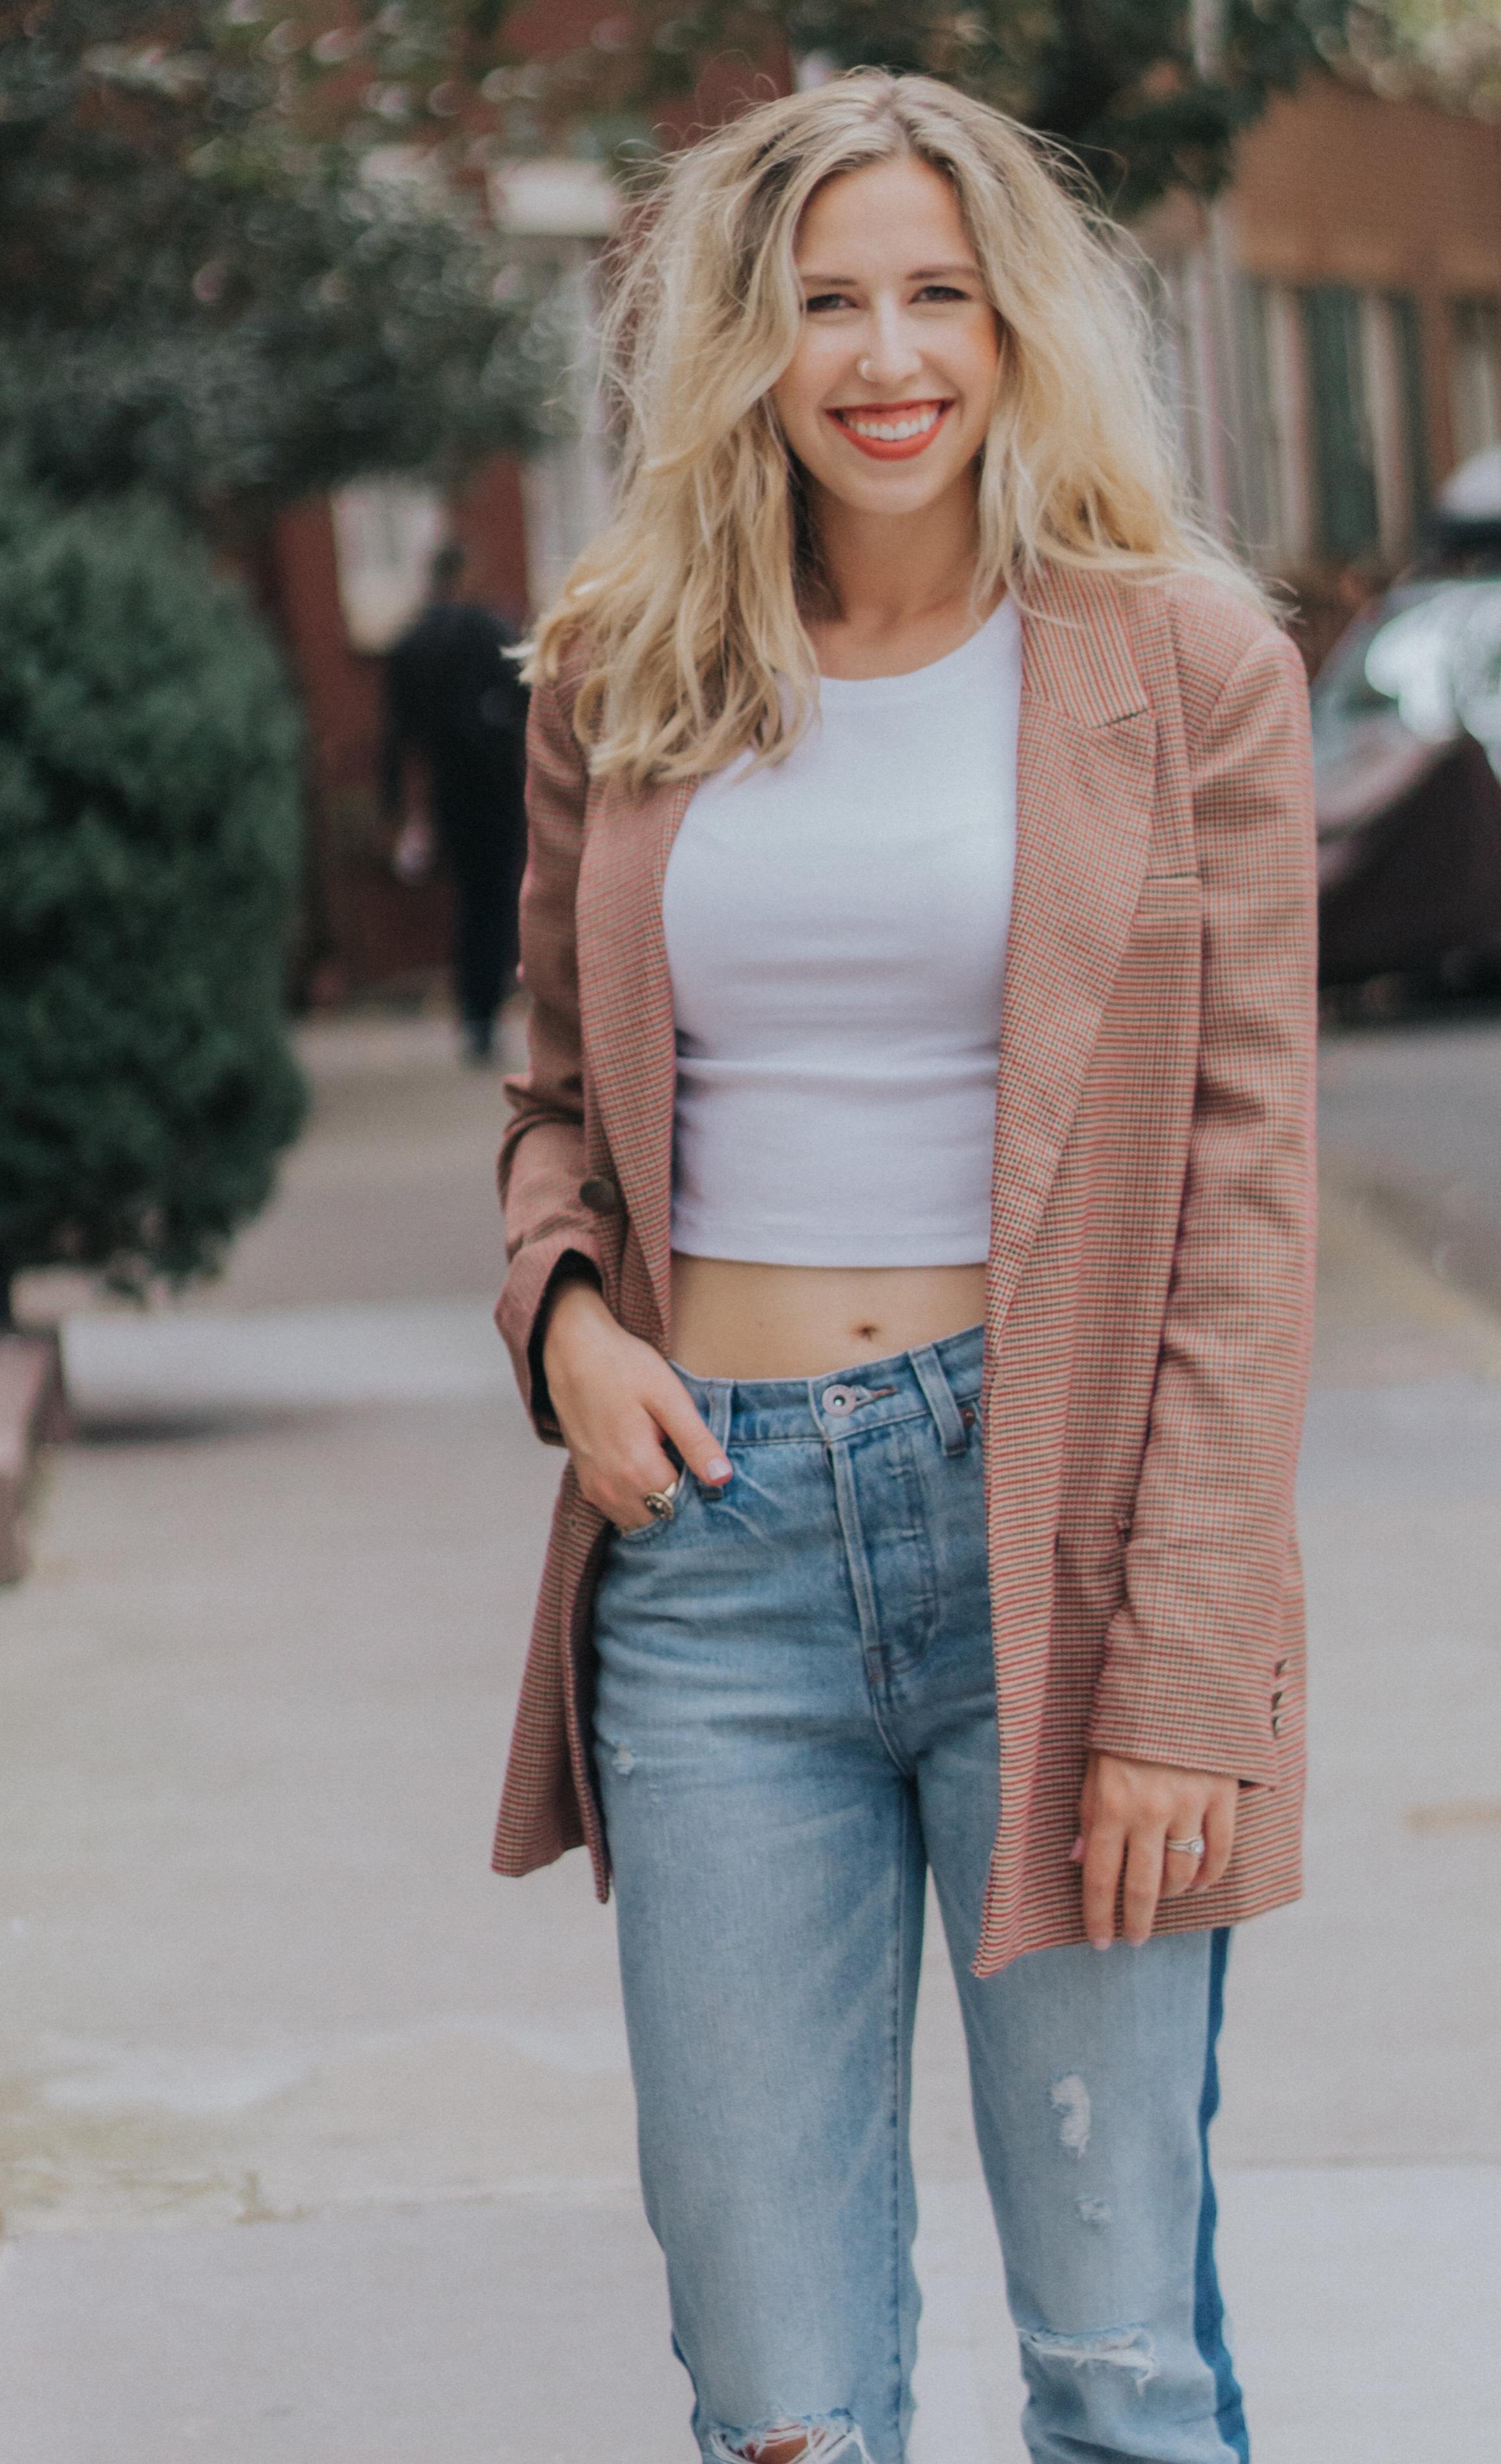 Simple Fall Look (Blazer + Crop Top) | The Simplistic Chic